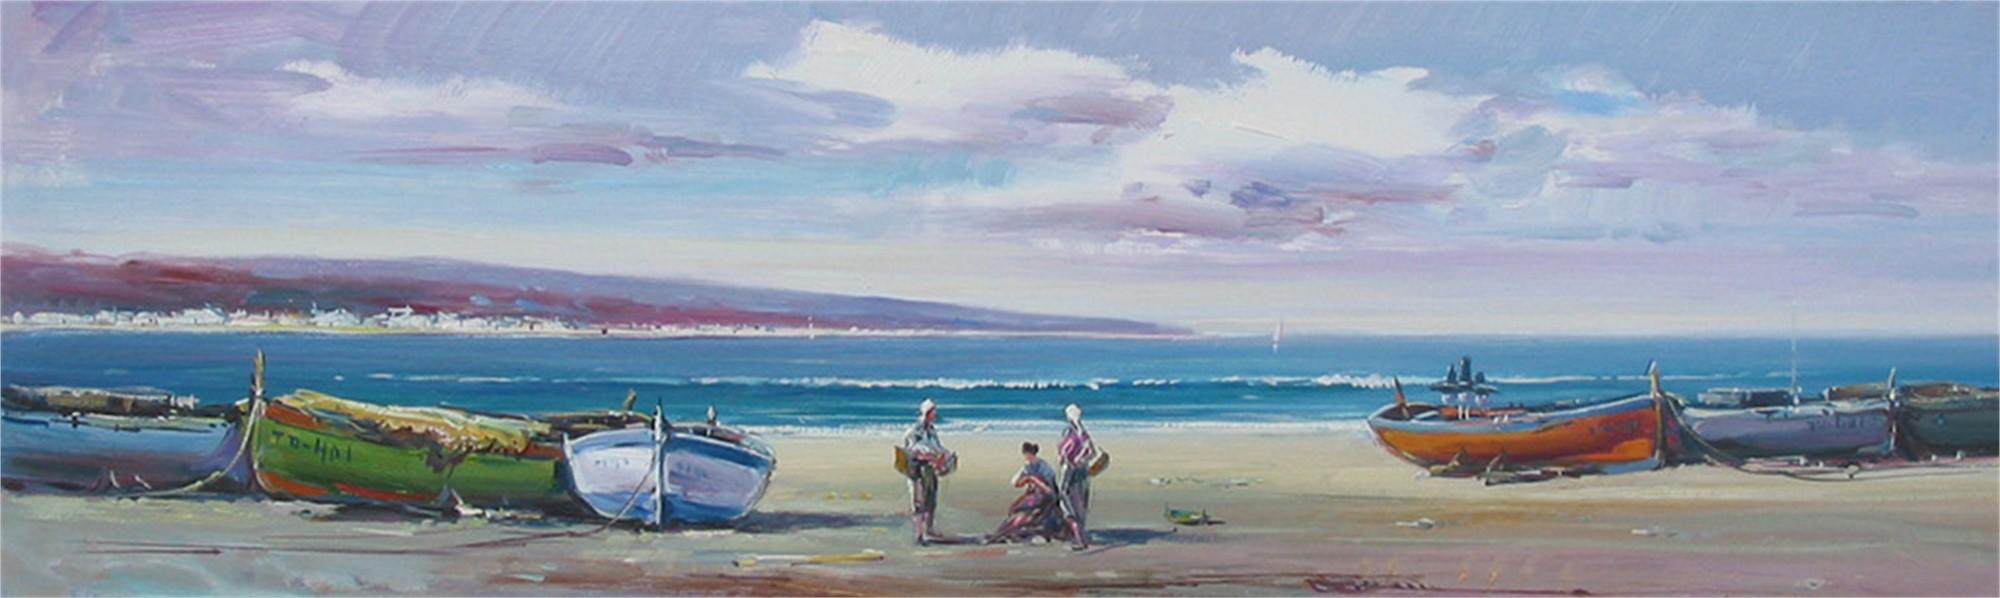 SEASCAPE by J. GONZALEZ